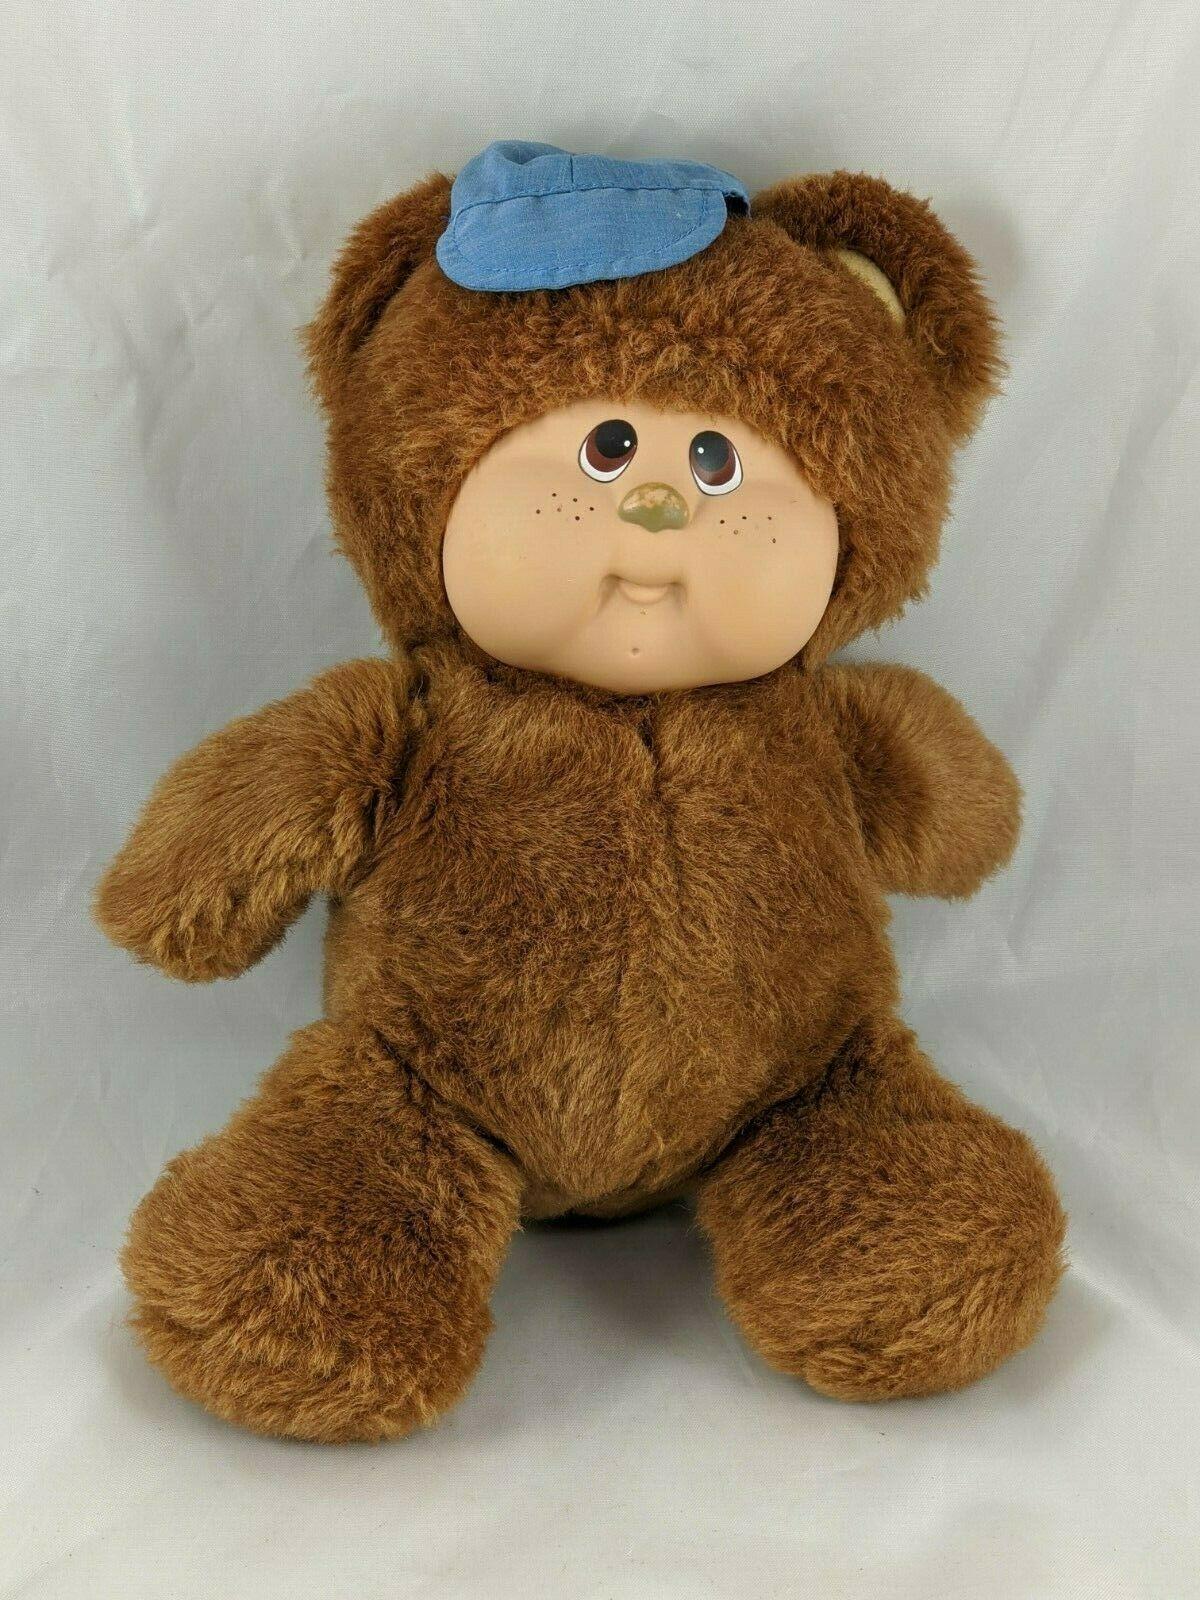 1980s Hasbro Softies MUNCHER THE RABBIT Plush